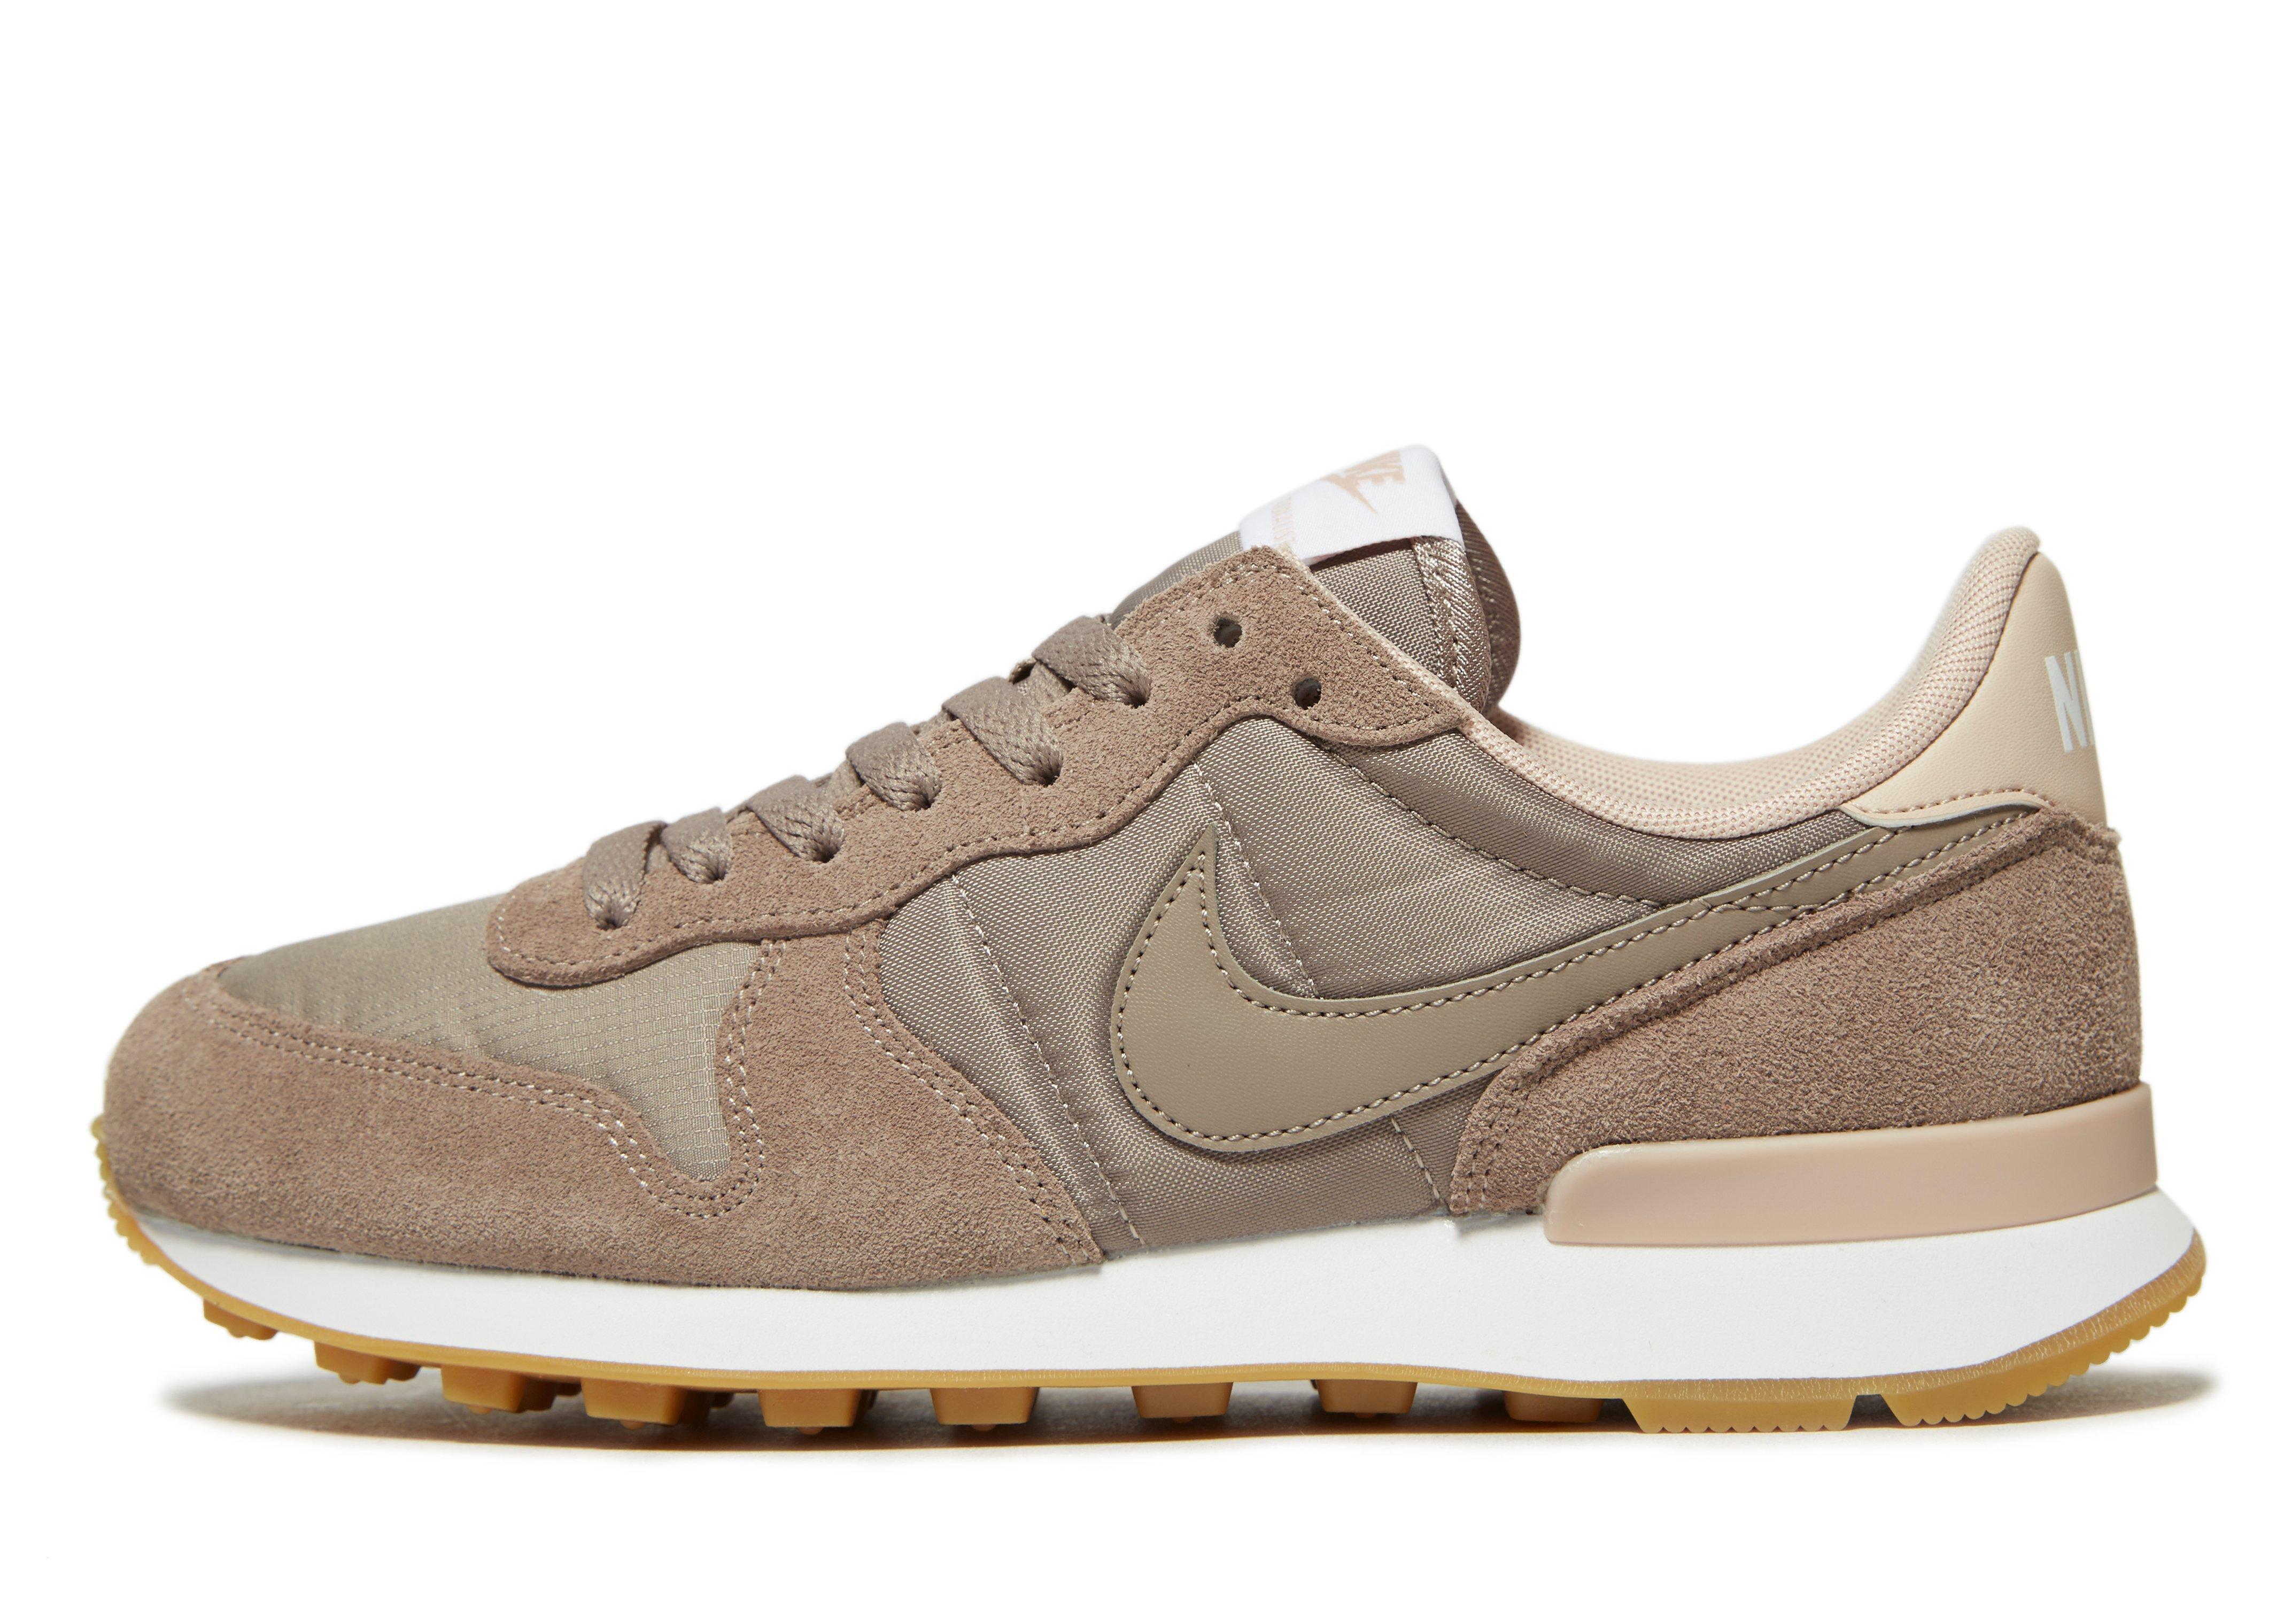 hot sale online 4516b f8ed3 Nike Internationalist in Brown - Lyst